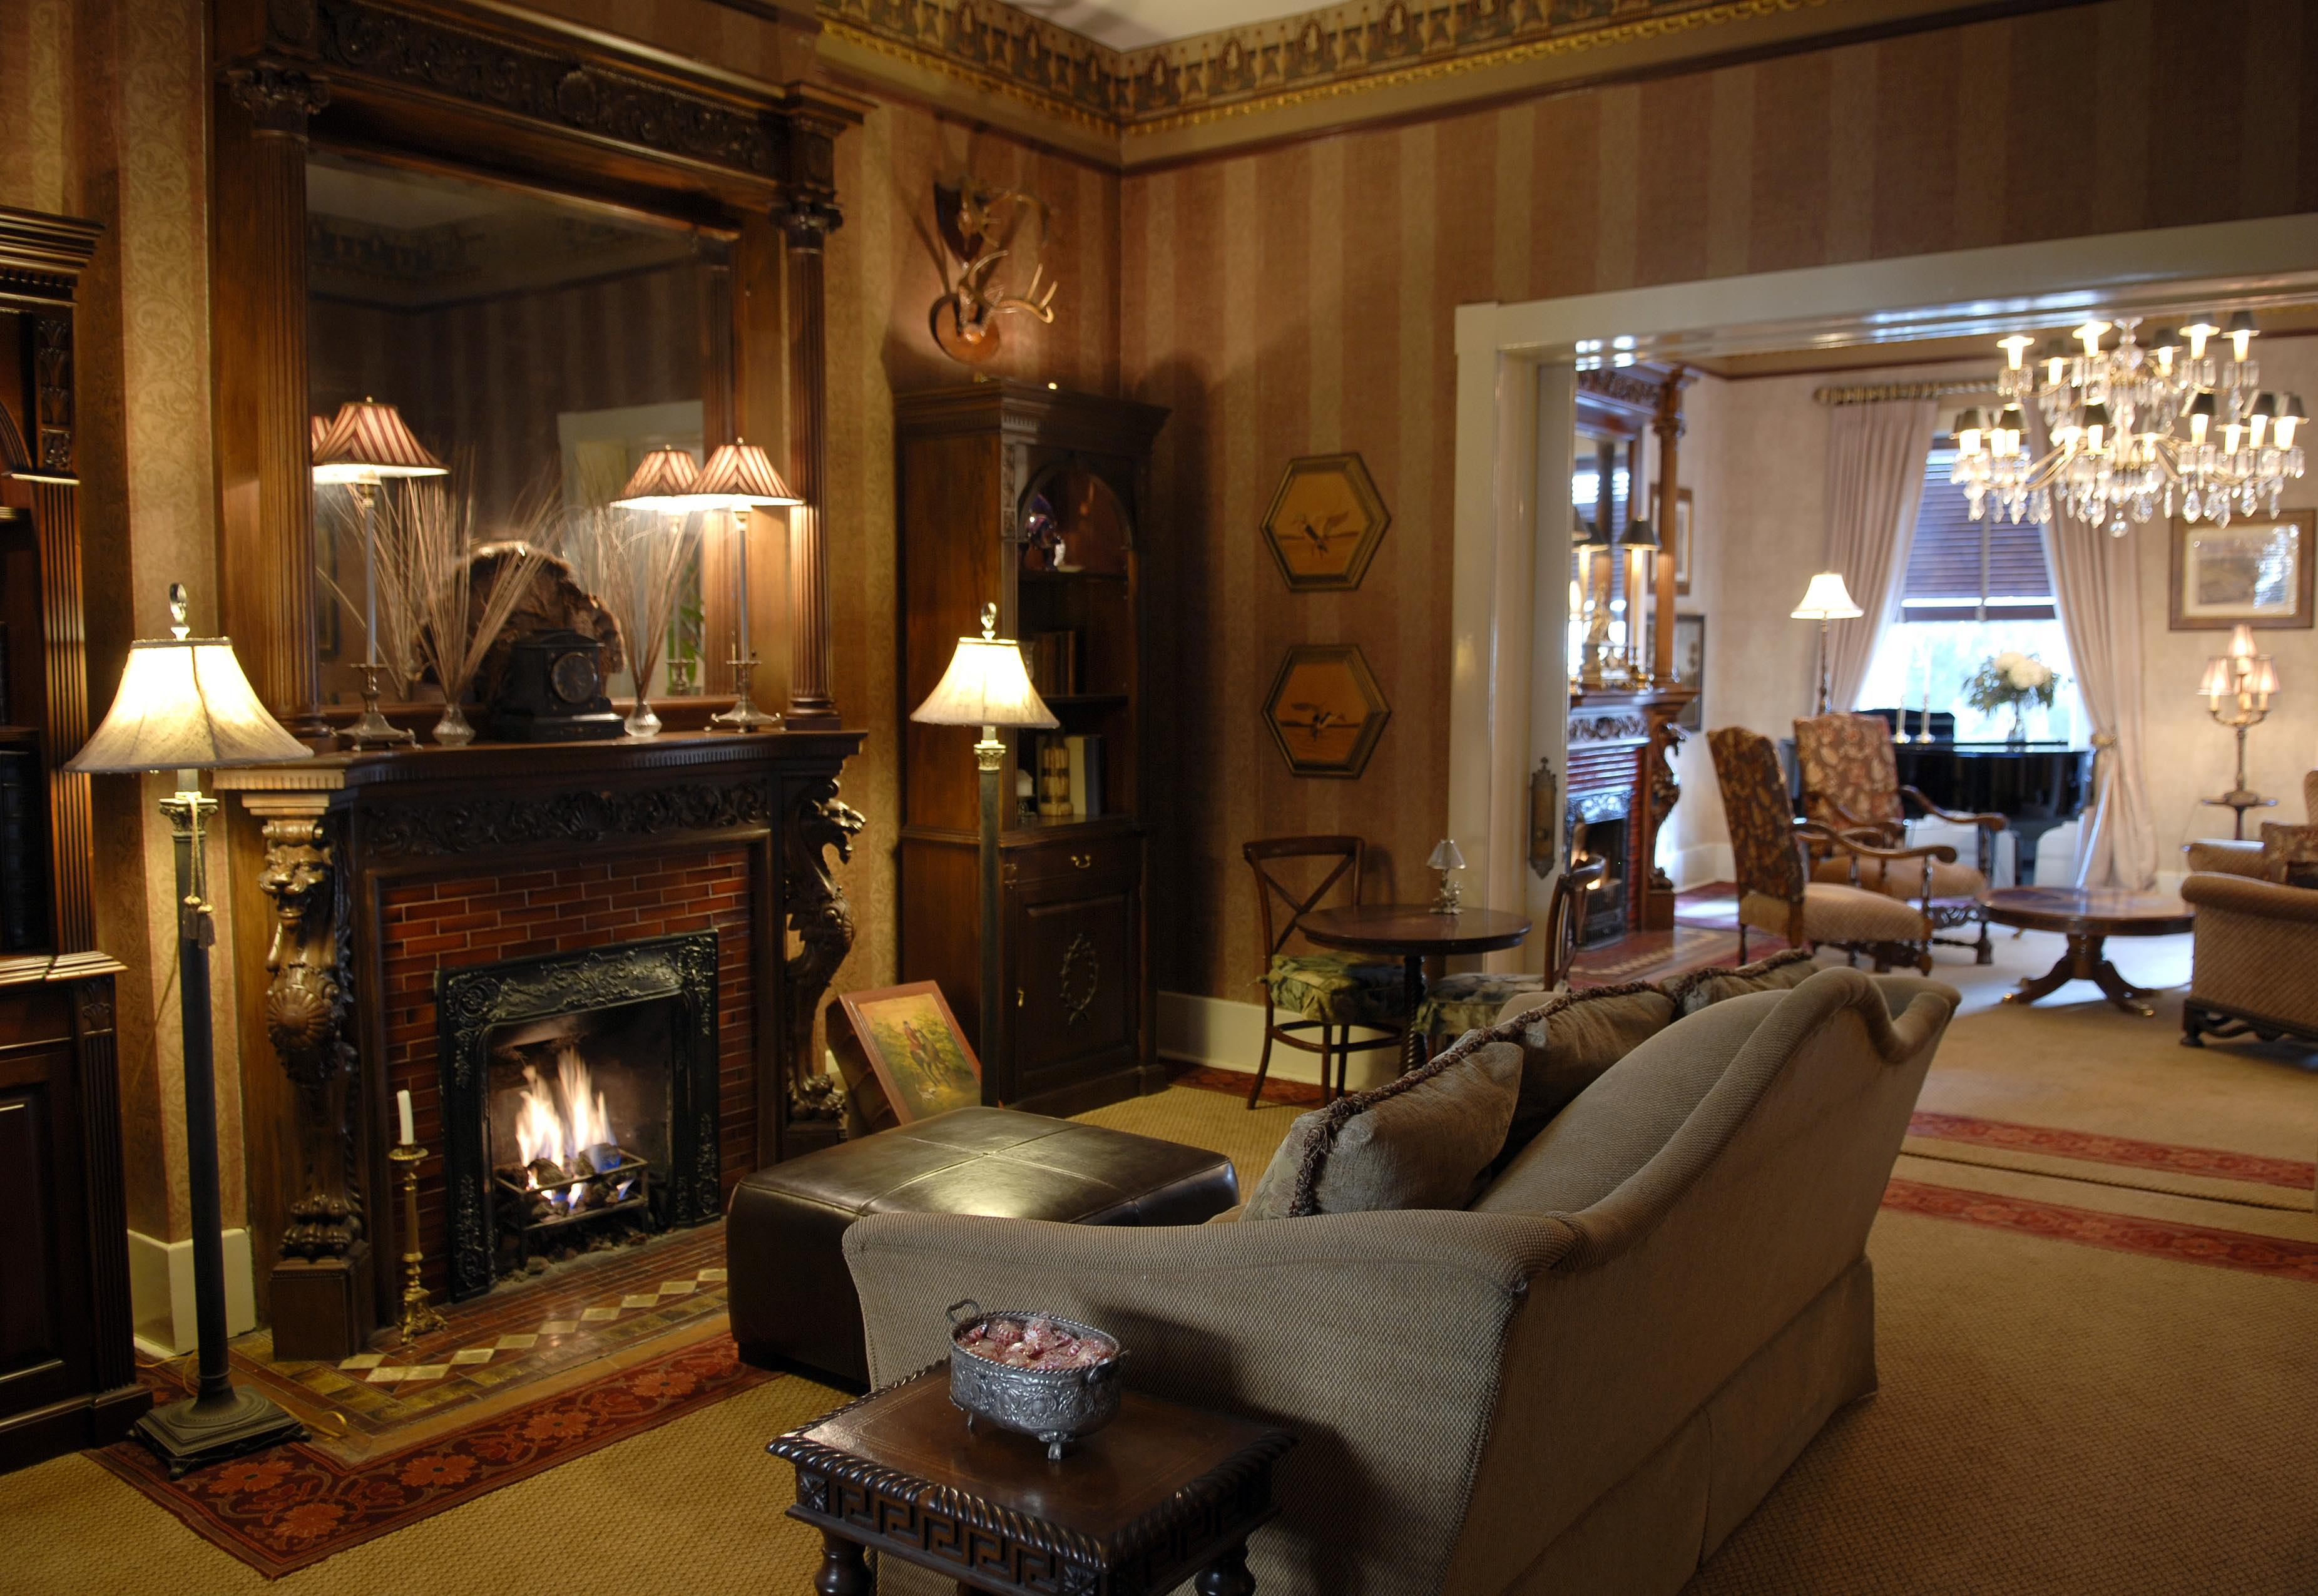 Admirable Savannah Boutique Hotels Foley House Inn Historic District Interior Design Ideas Clesiryabchikinfo